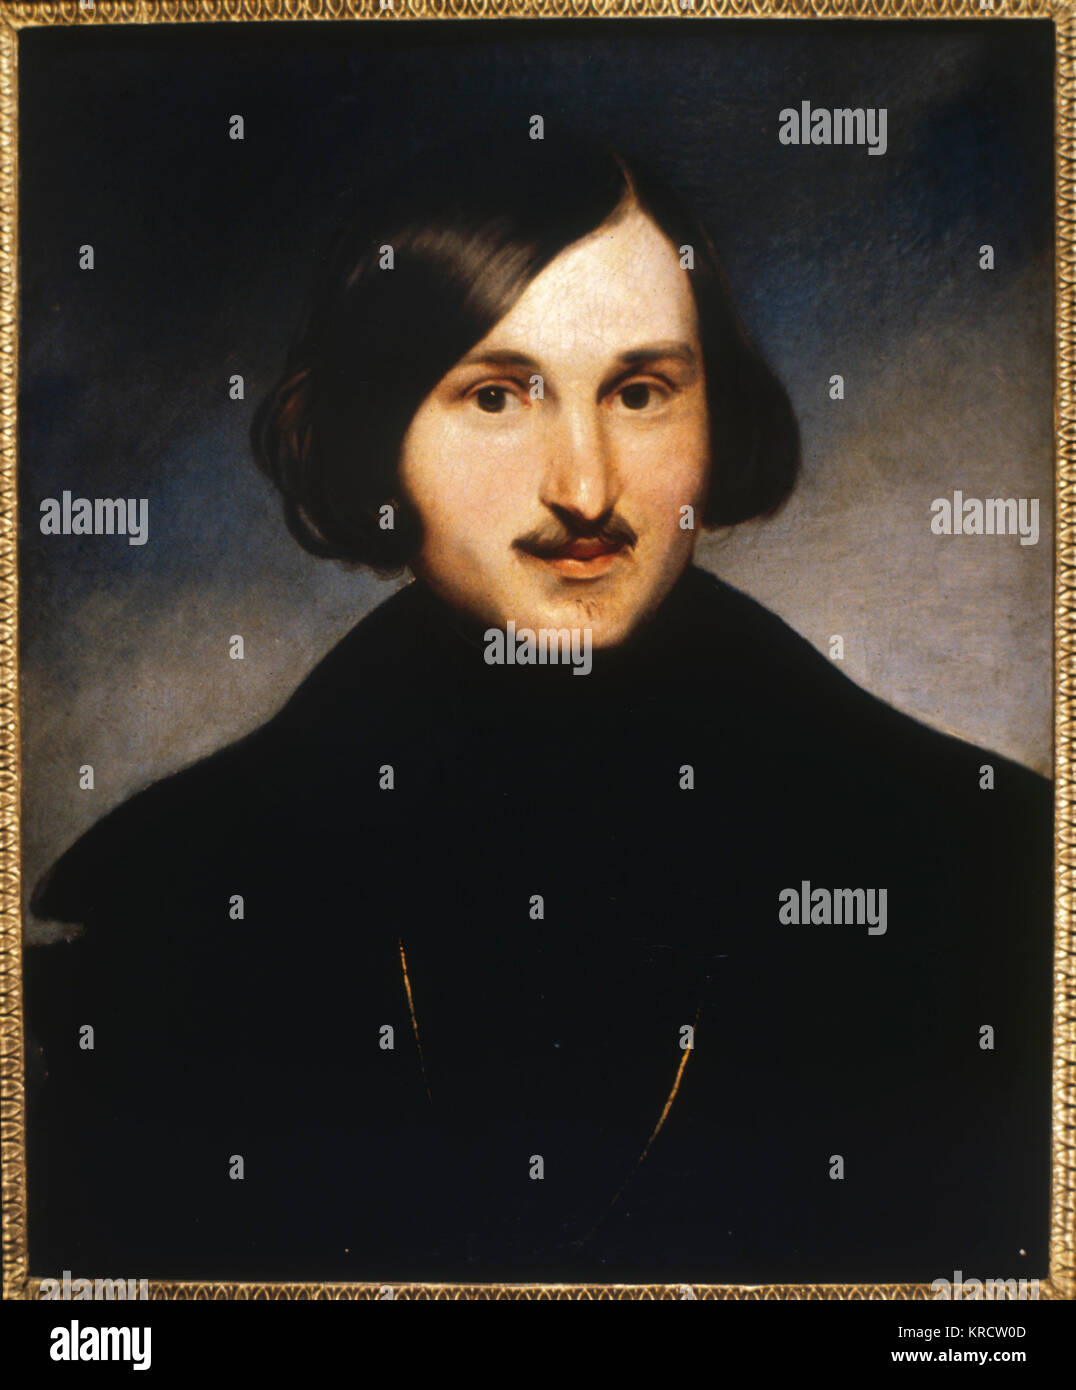 NIKOLAI VASILIEVICH GOGOL Russian writer Date: 1809 - 1852 - Stock Image